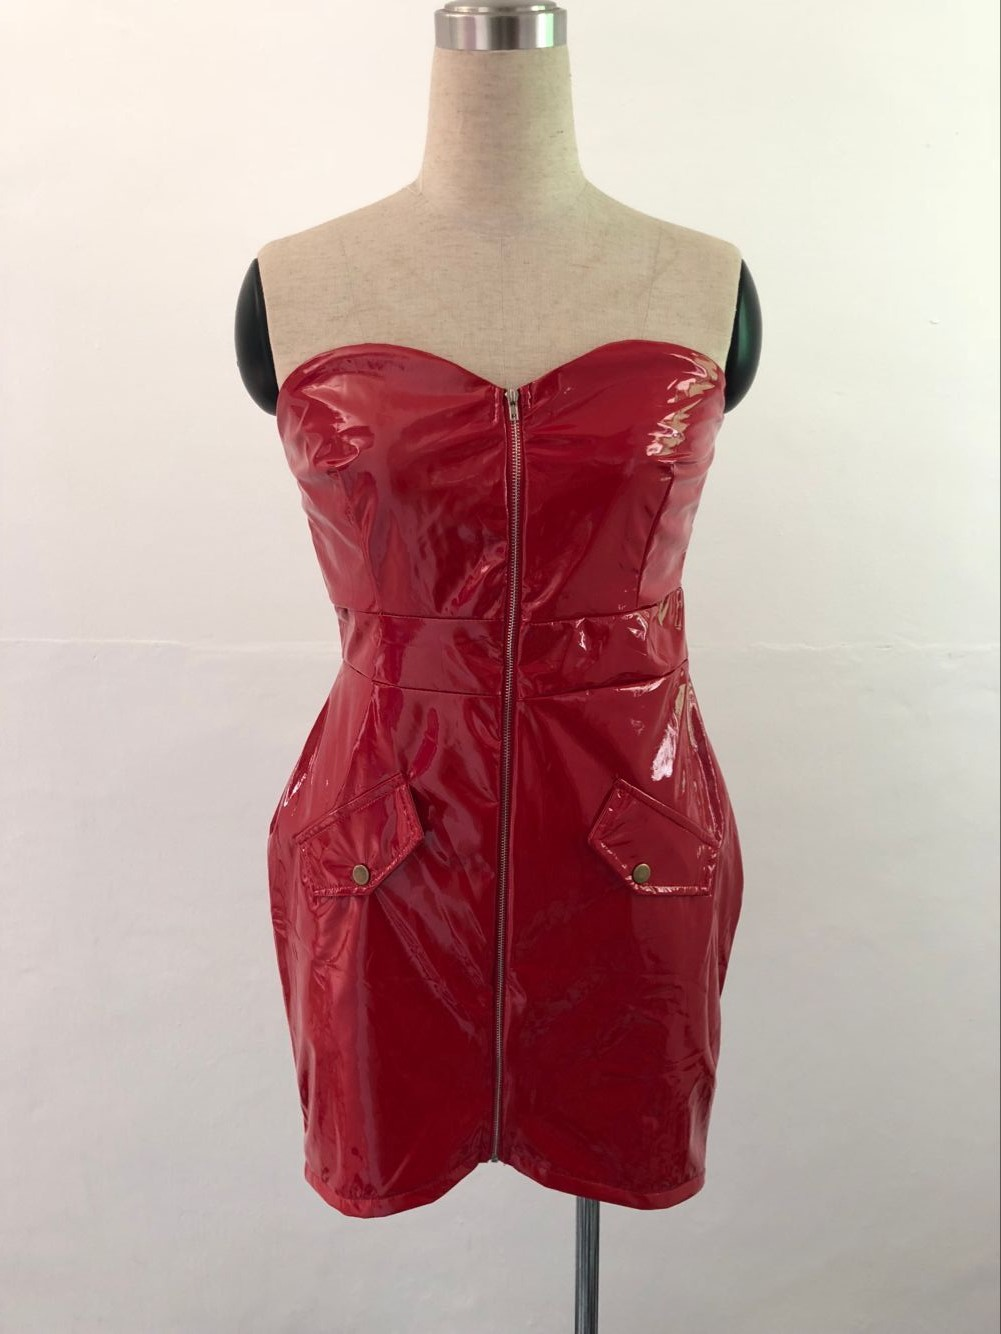 0bd417bac05 2018 Sexy Women PU Leather Dress Front Zipper Boob Tube Top Dress ...